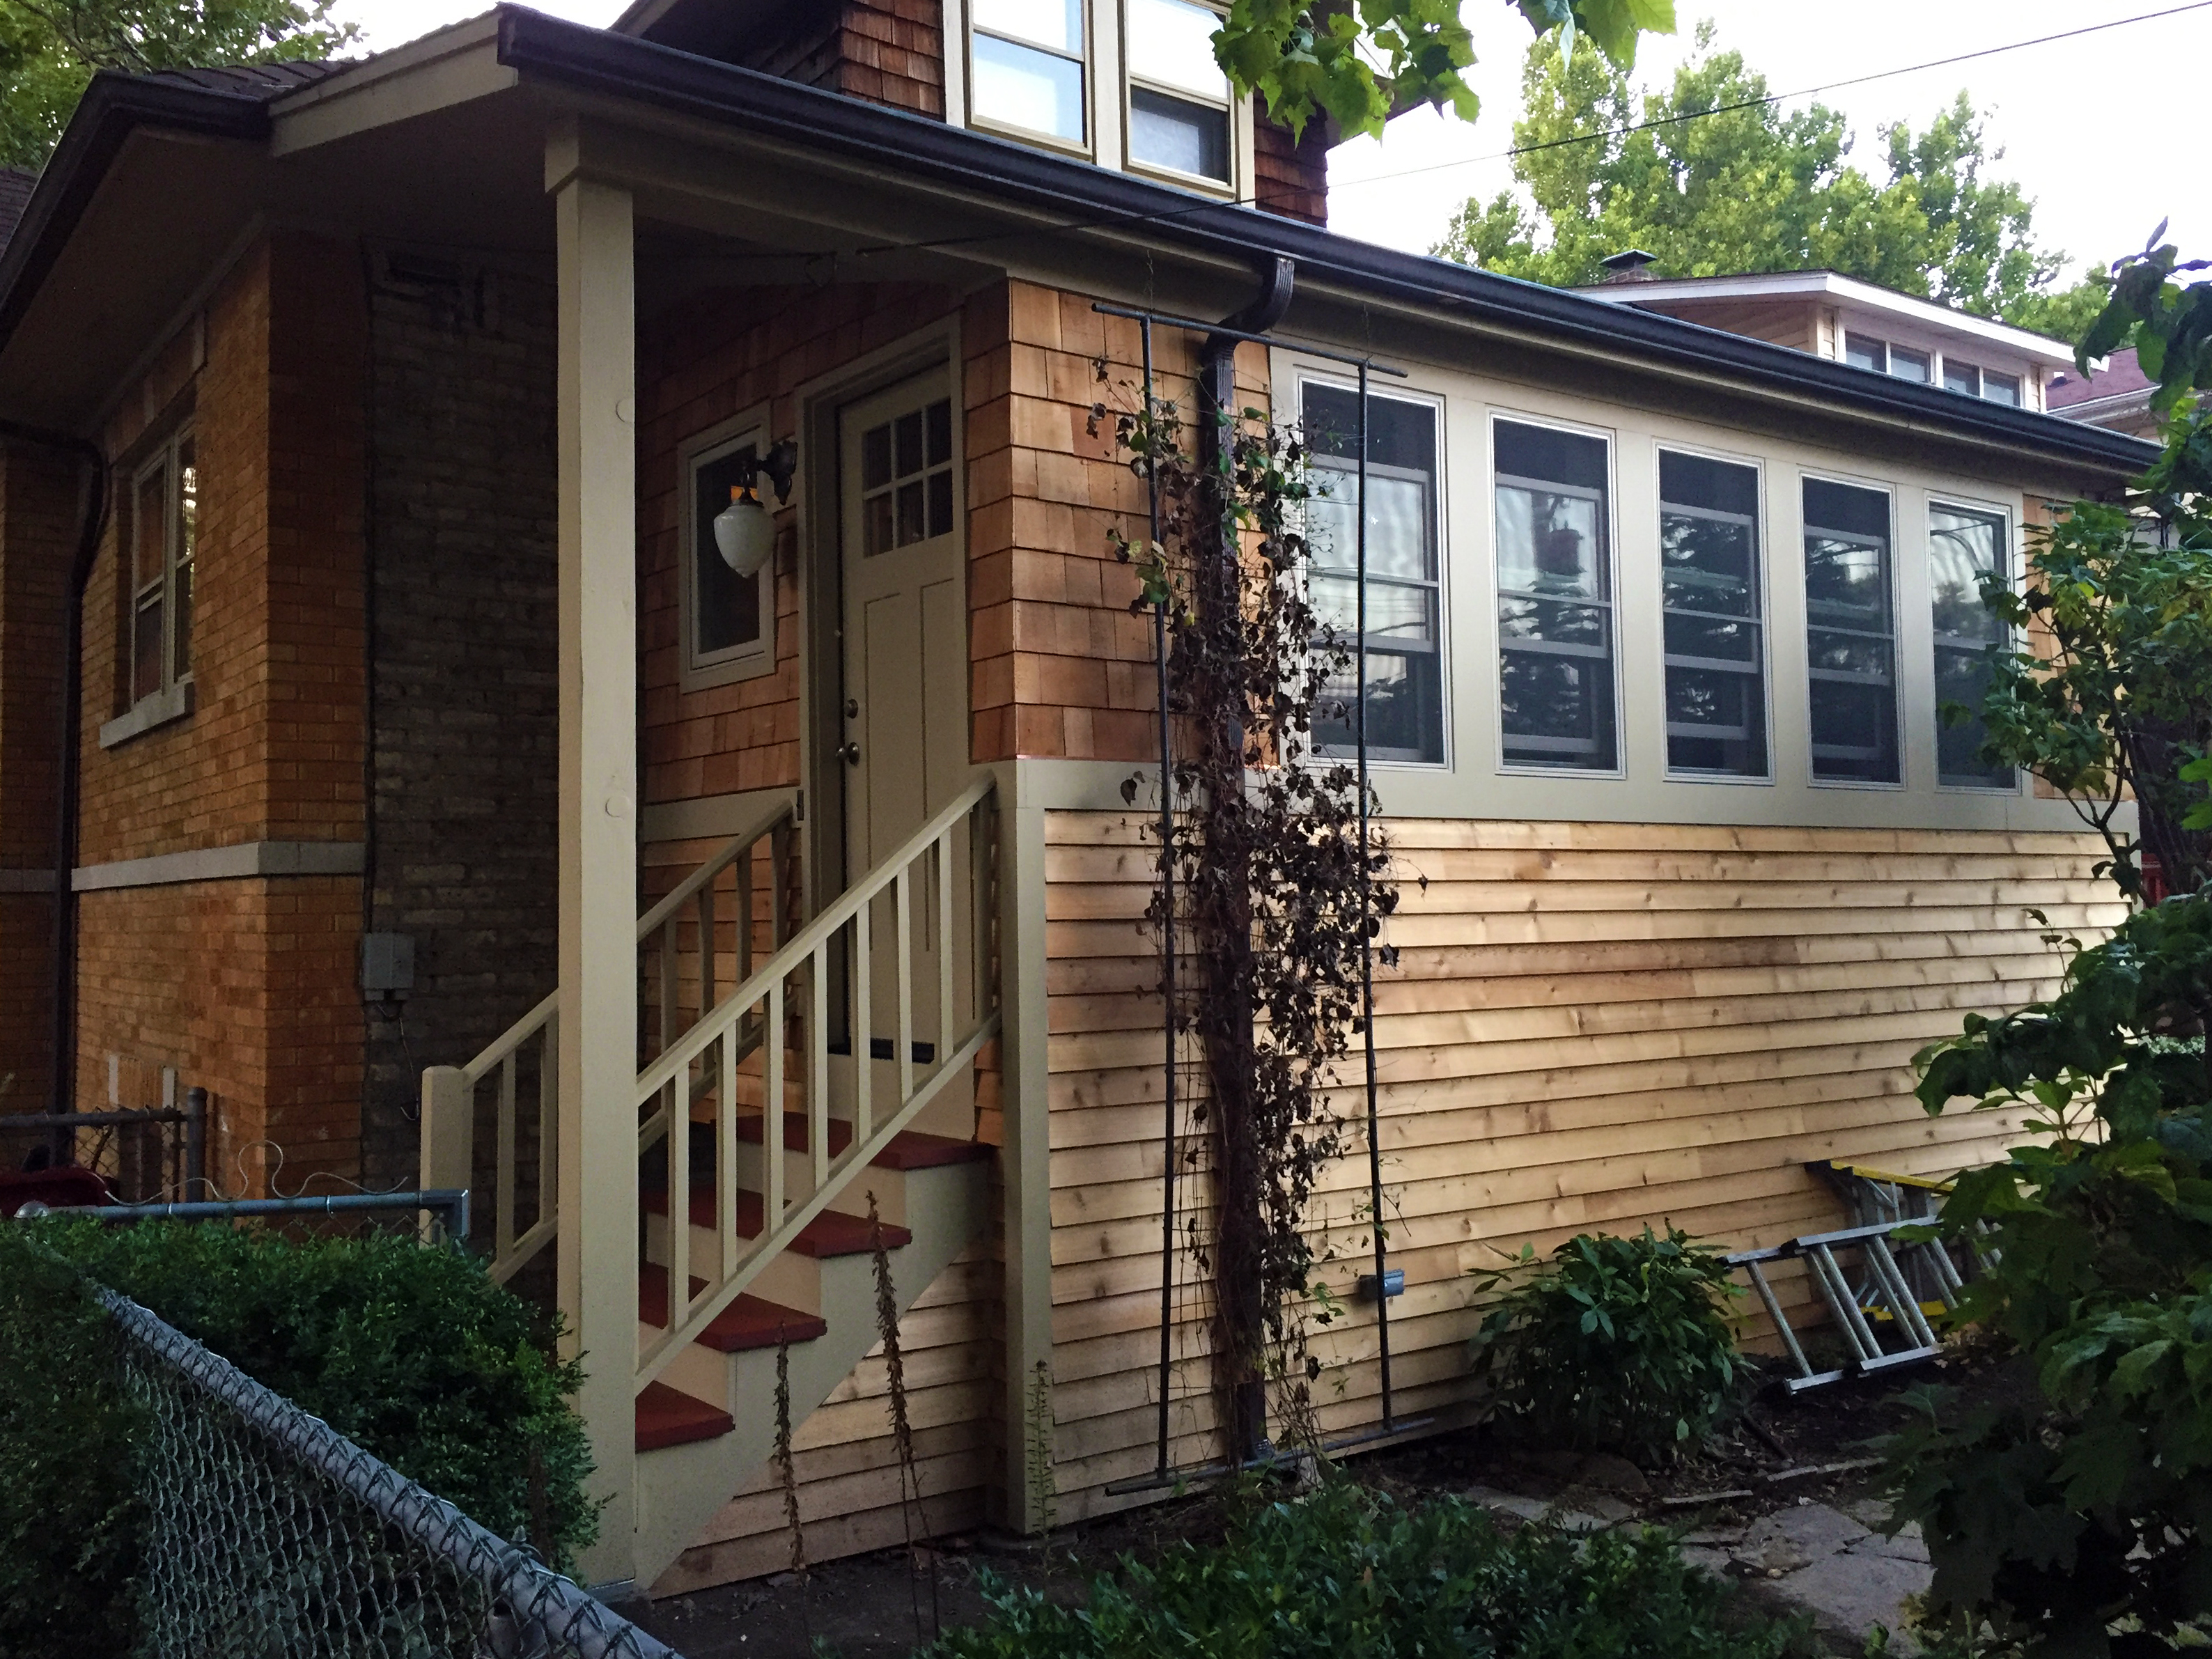 Charming Chicago Bungalows Win Driehaus Renovation Awards